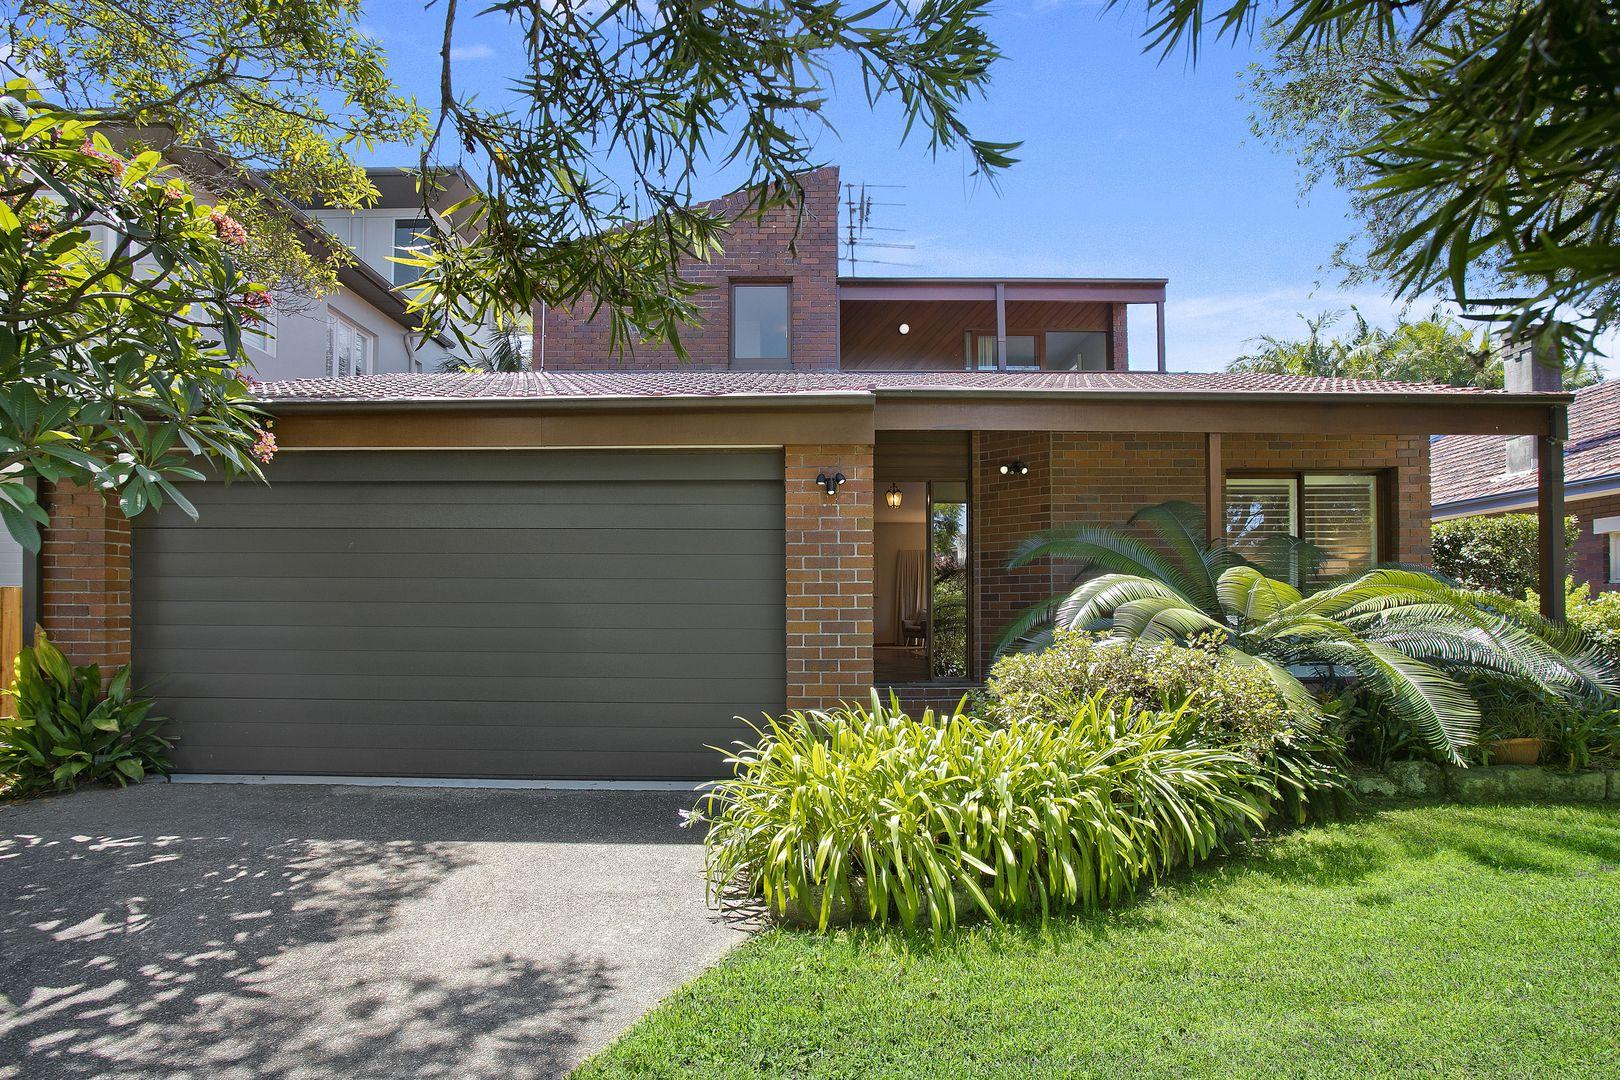 11 Lower Almora Street, Mosman NSW 2088, Image 0